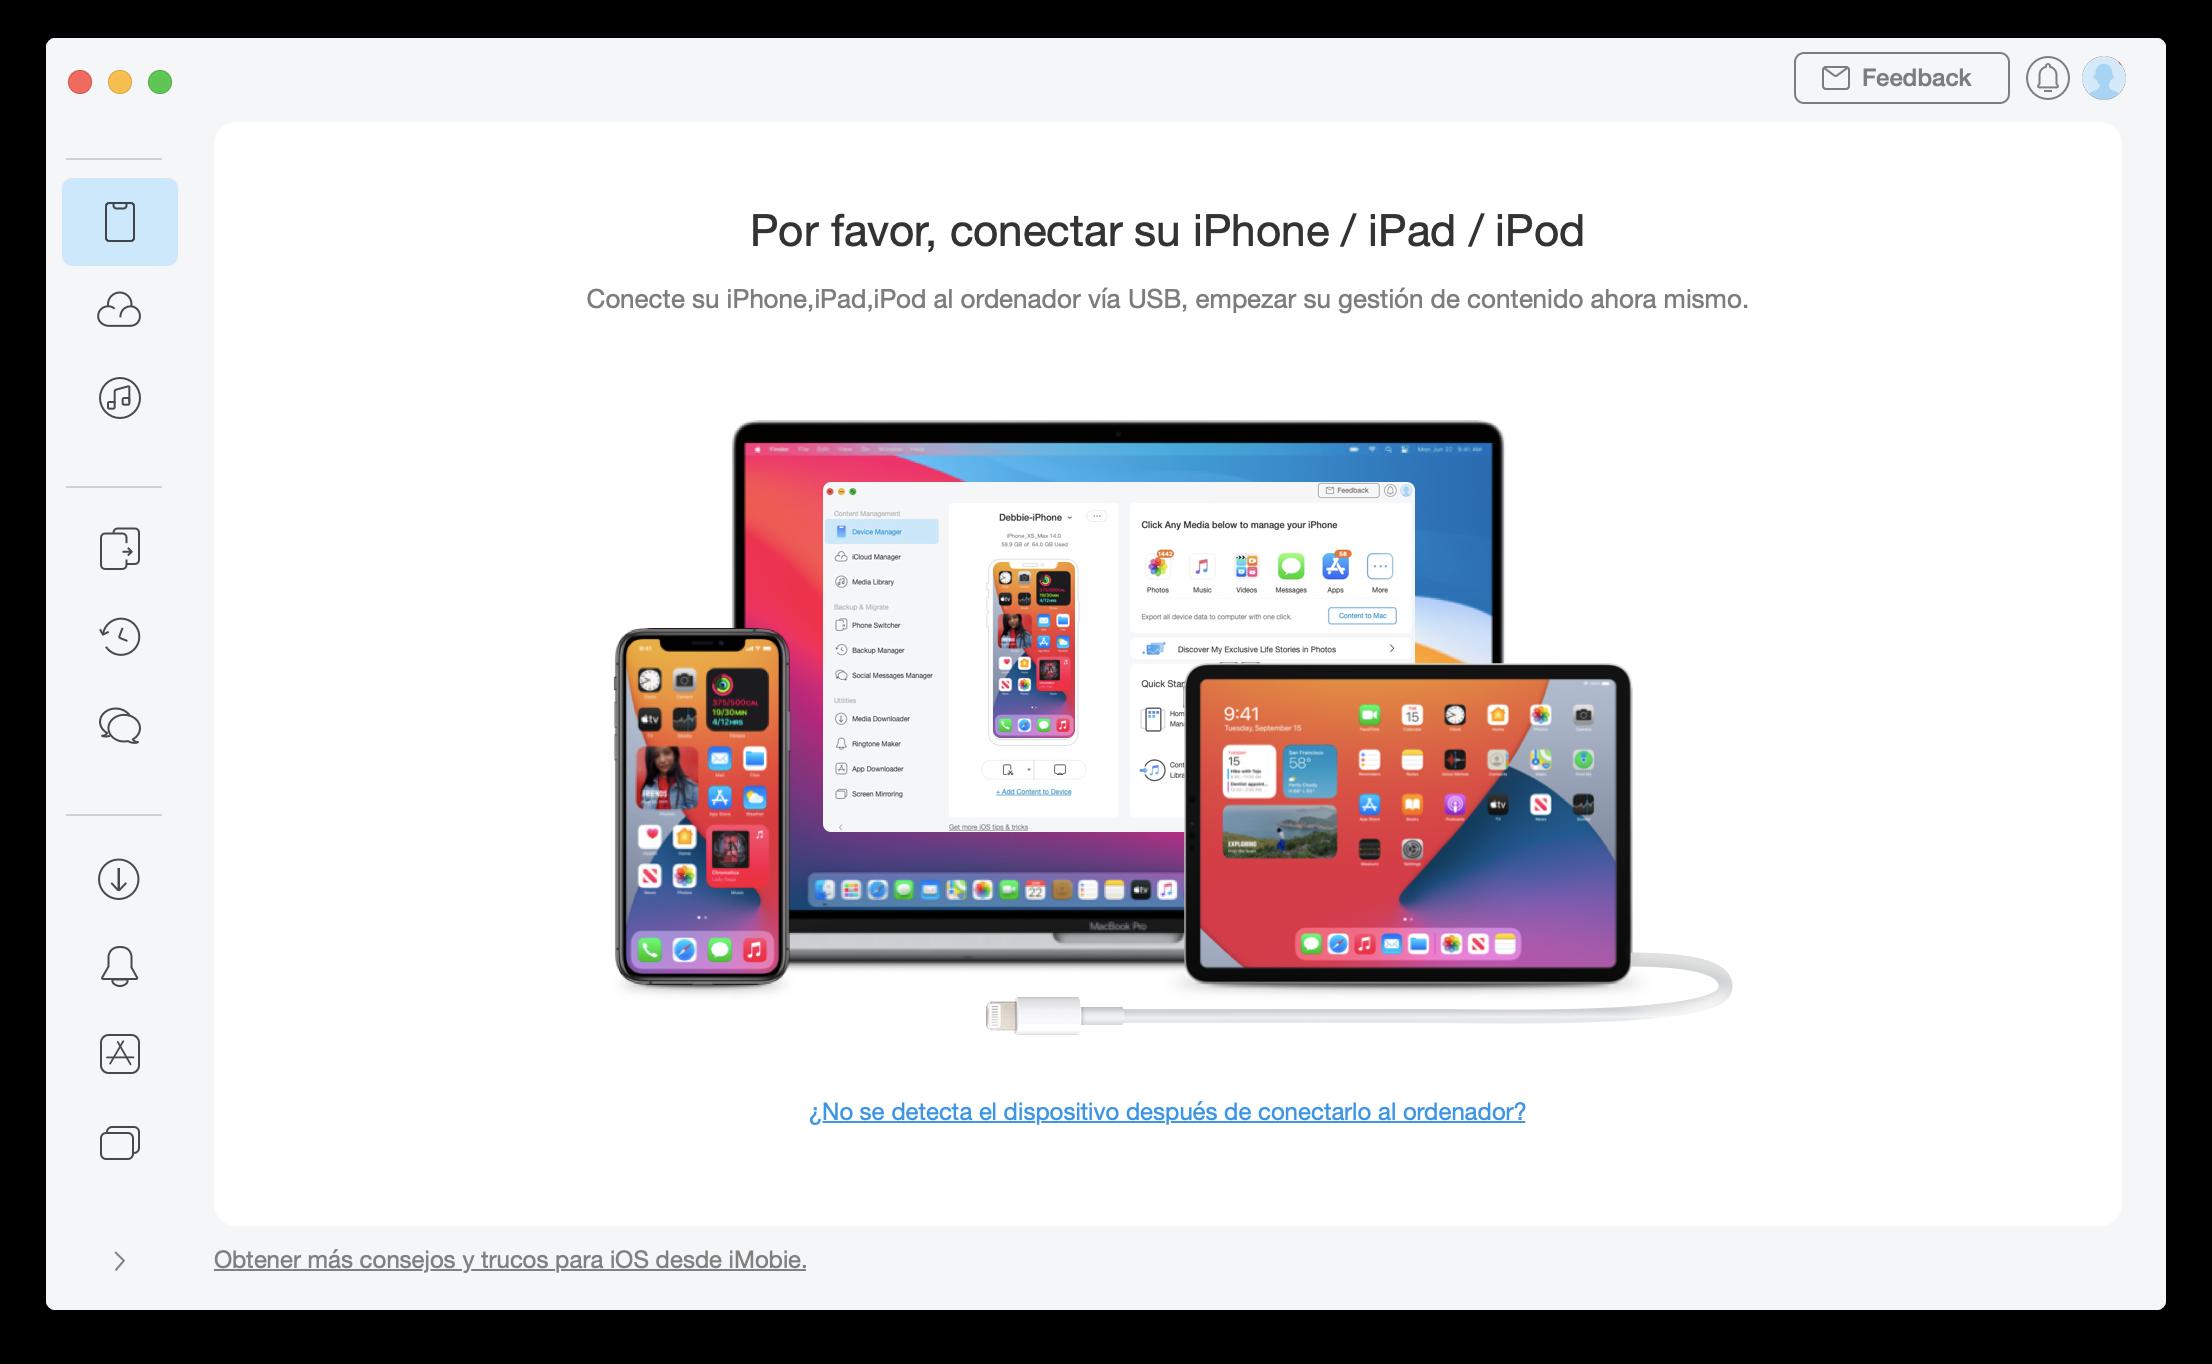 conectar su iPhone